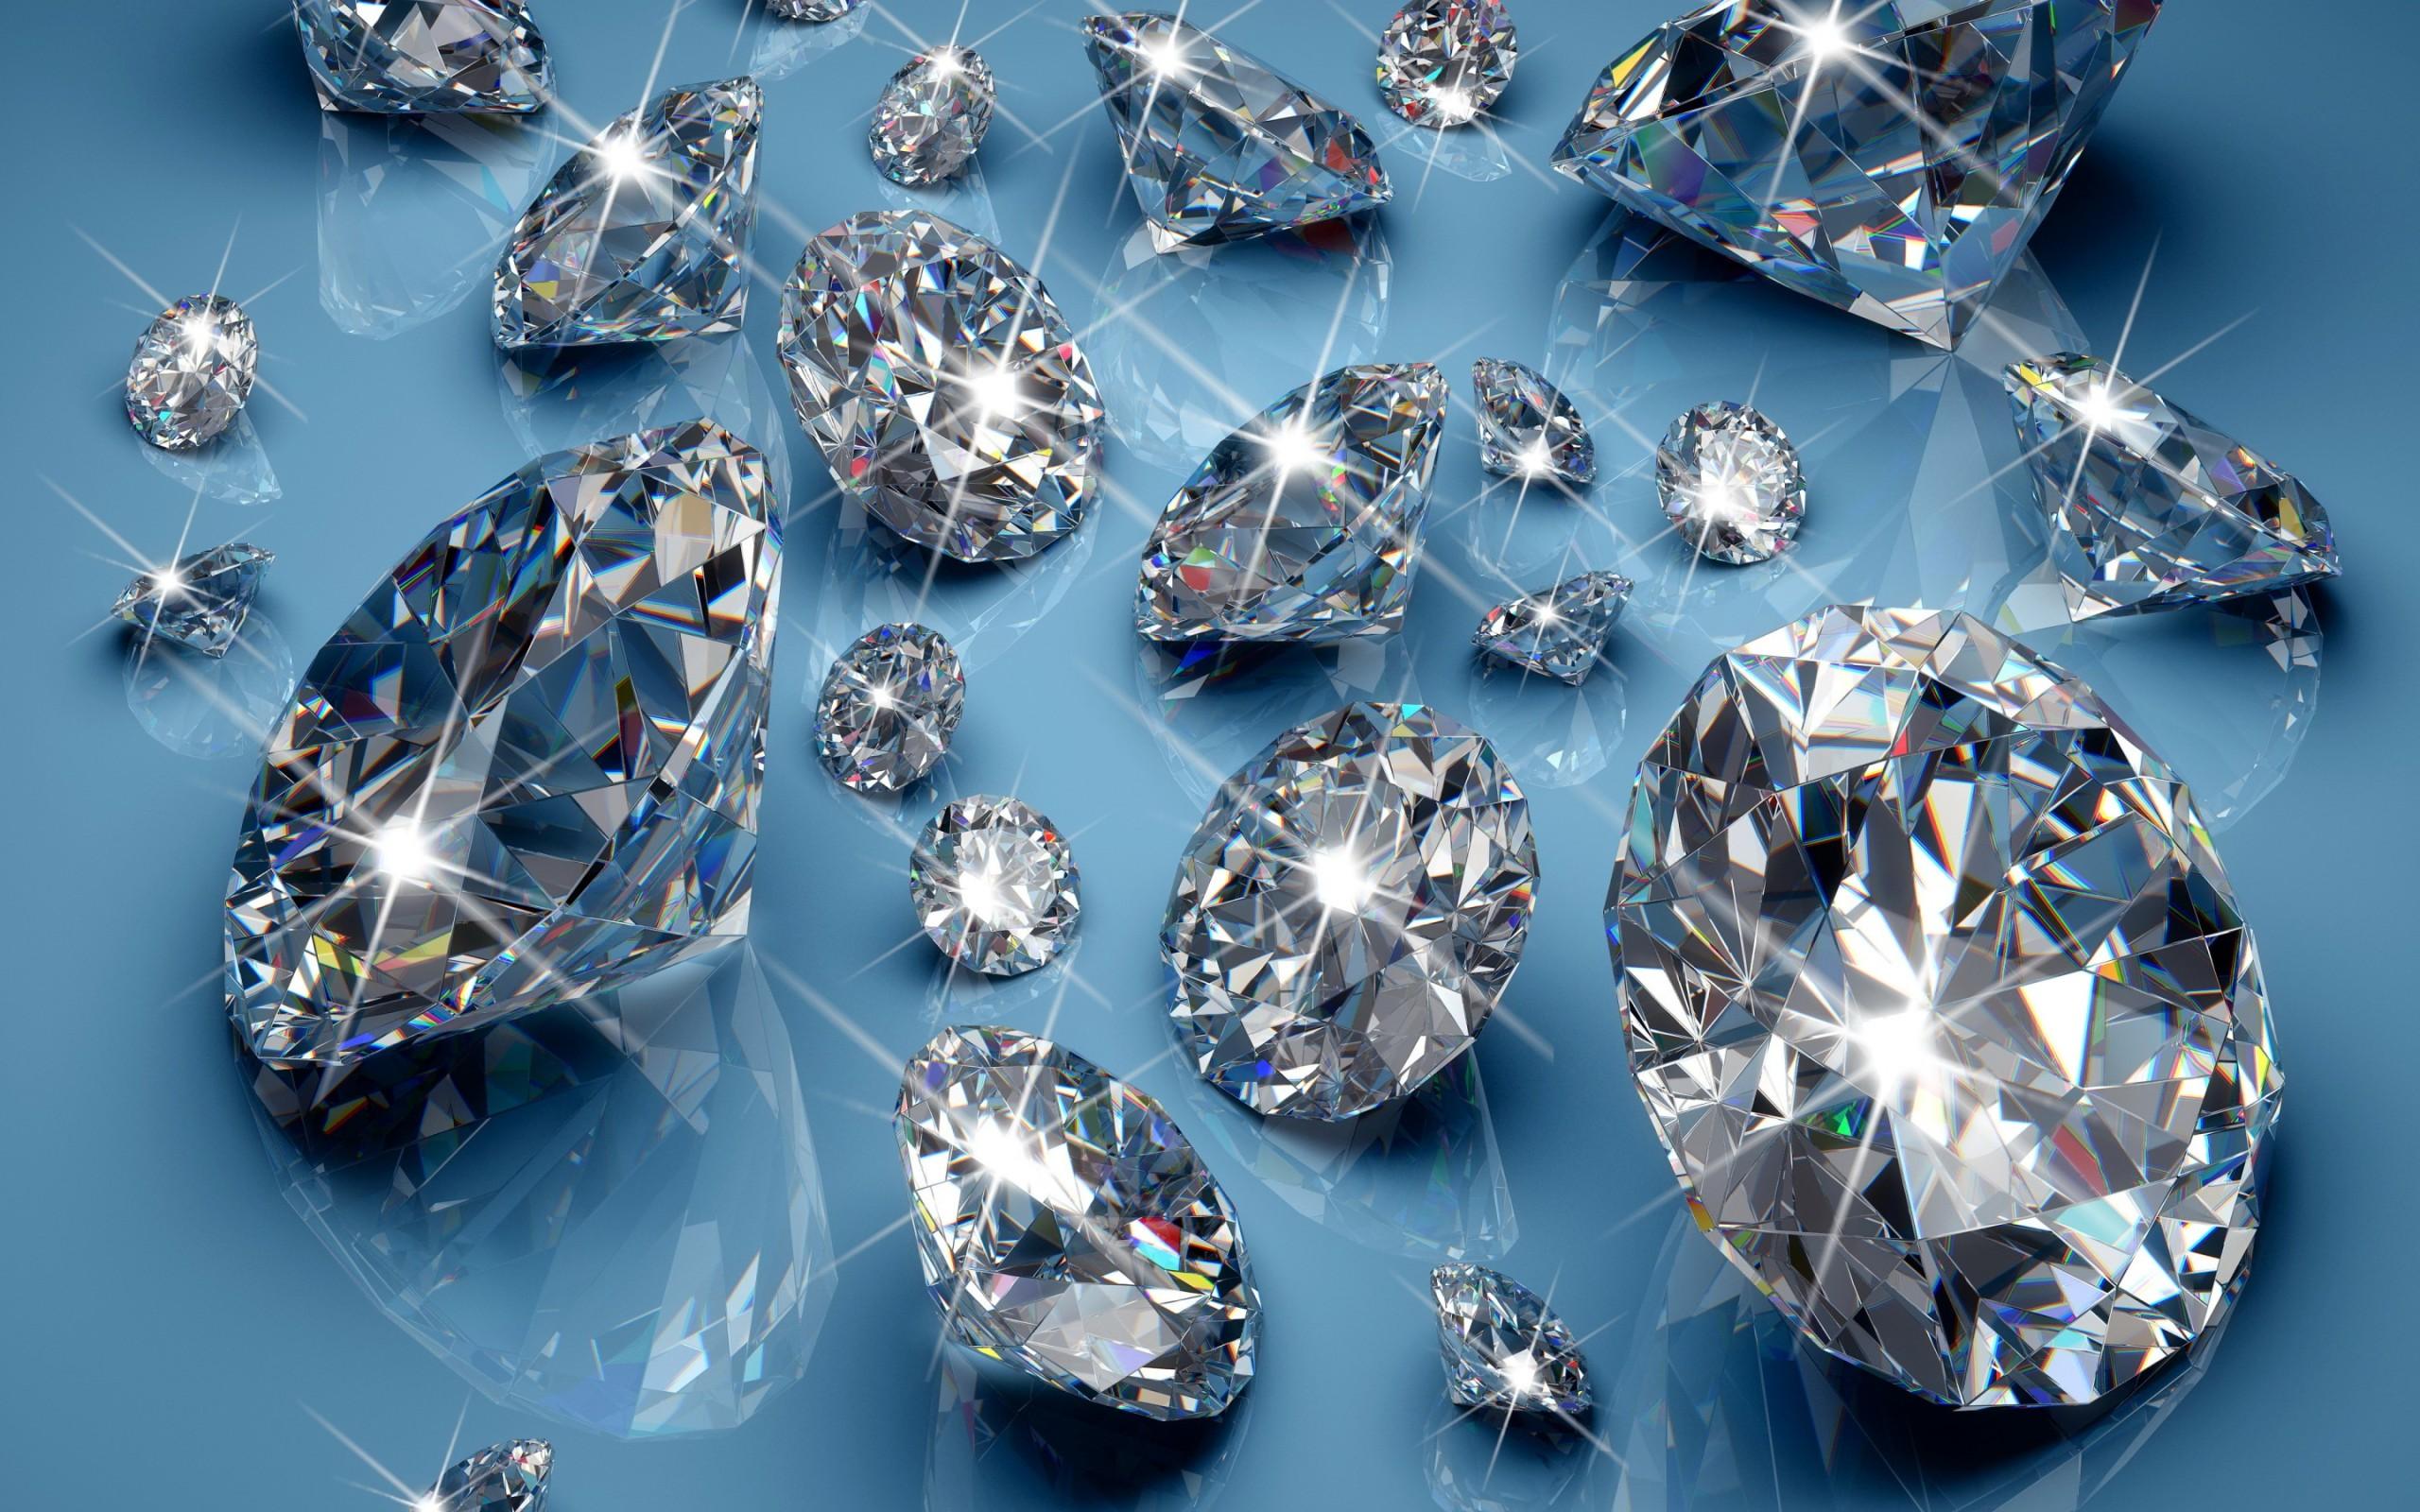 sparkling diamond wallpaper background 48969 50614 hd wallpapersjpg 2560x1600